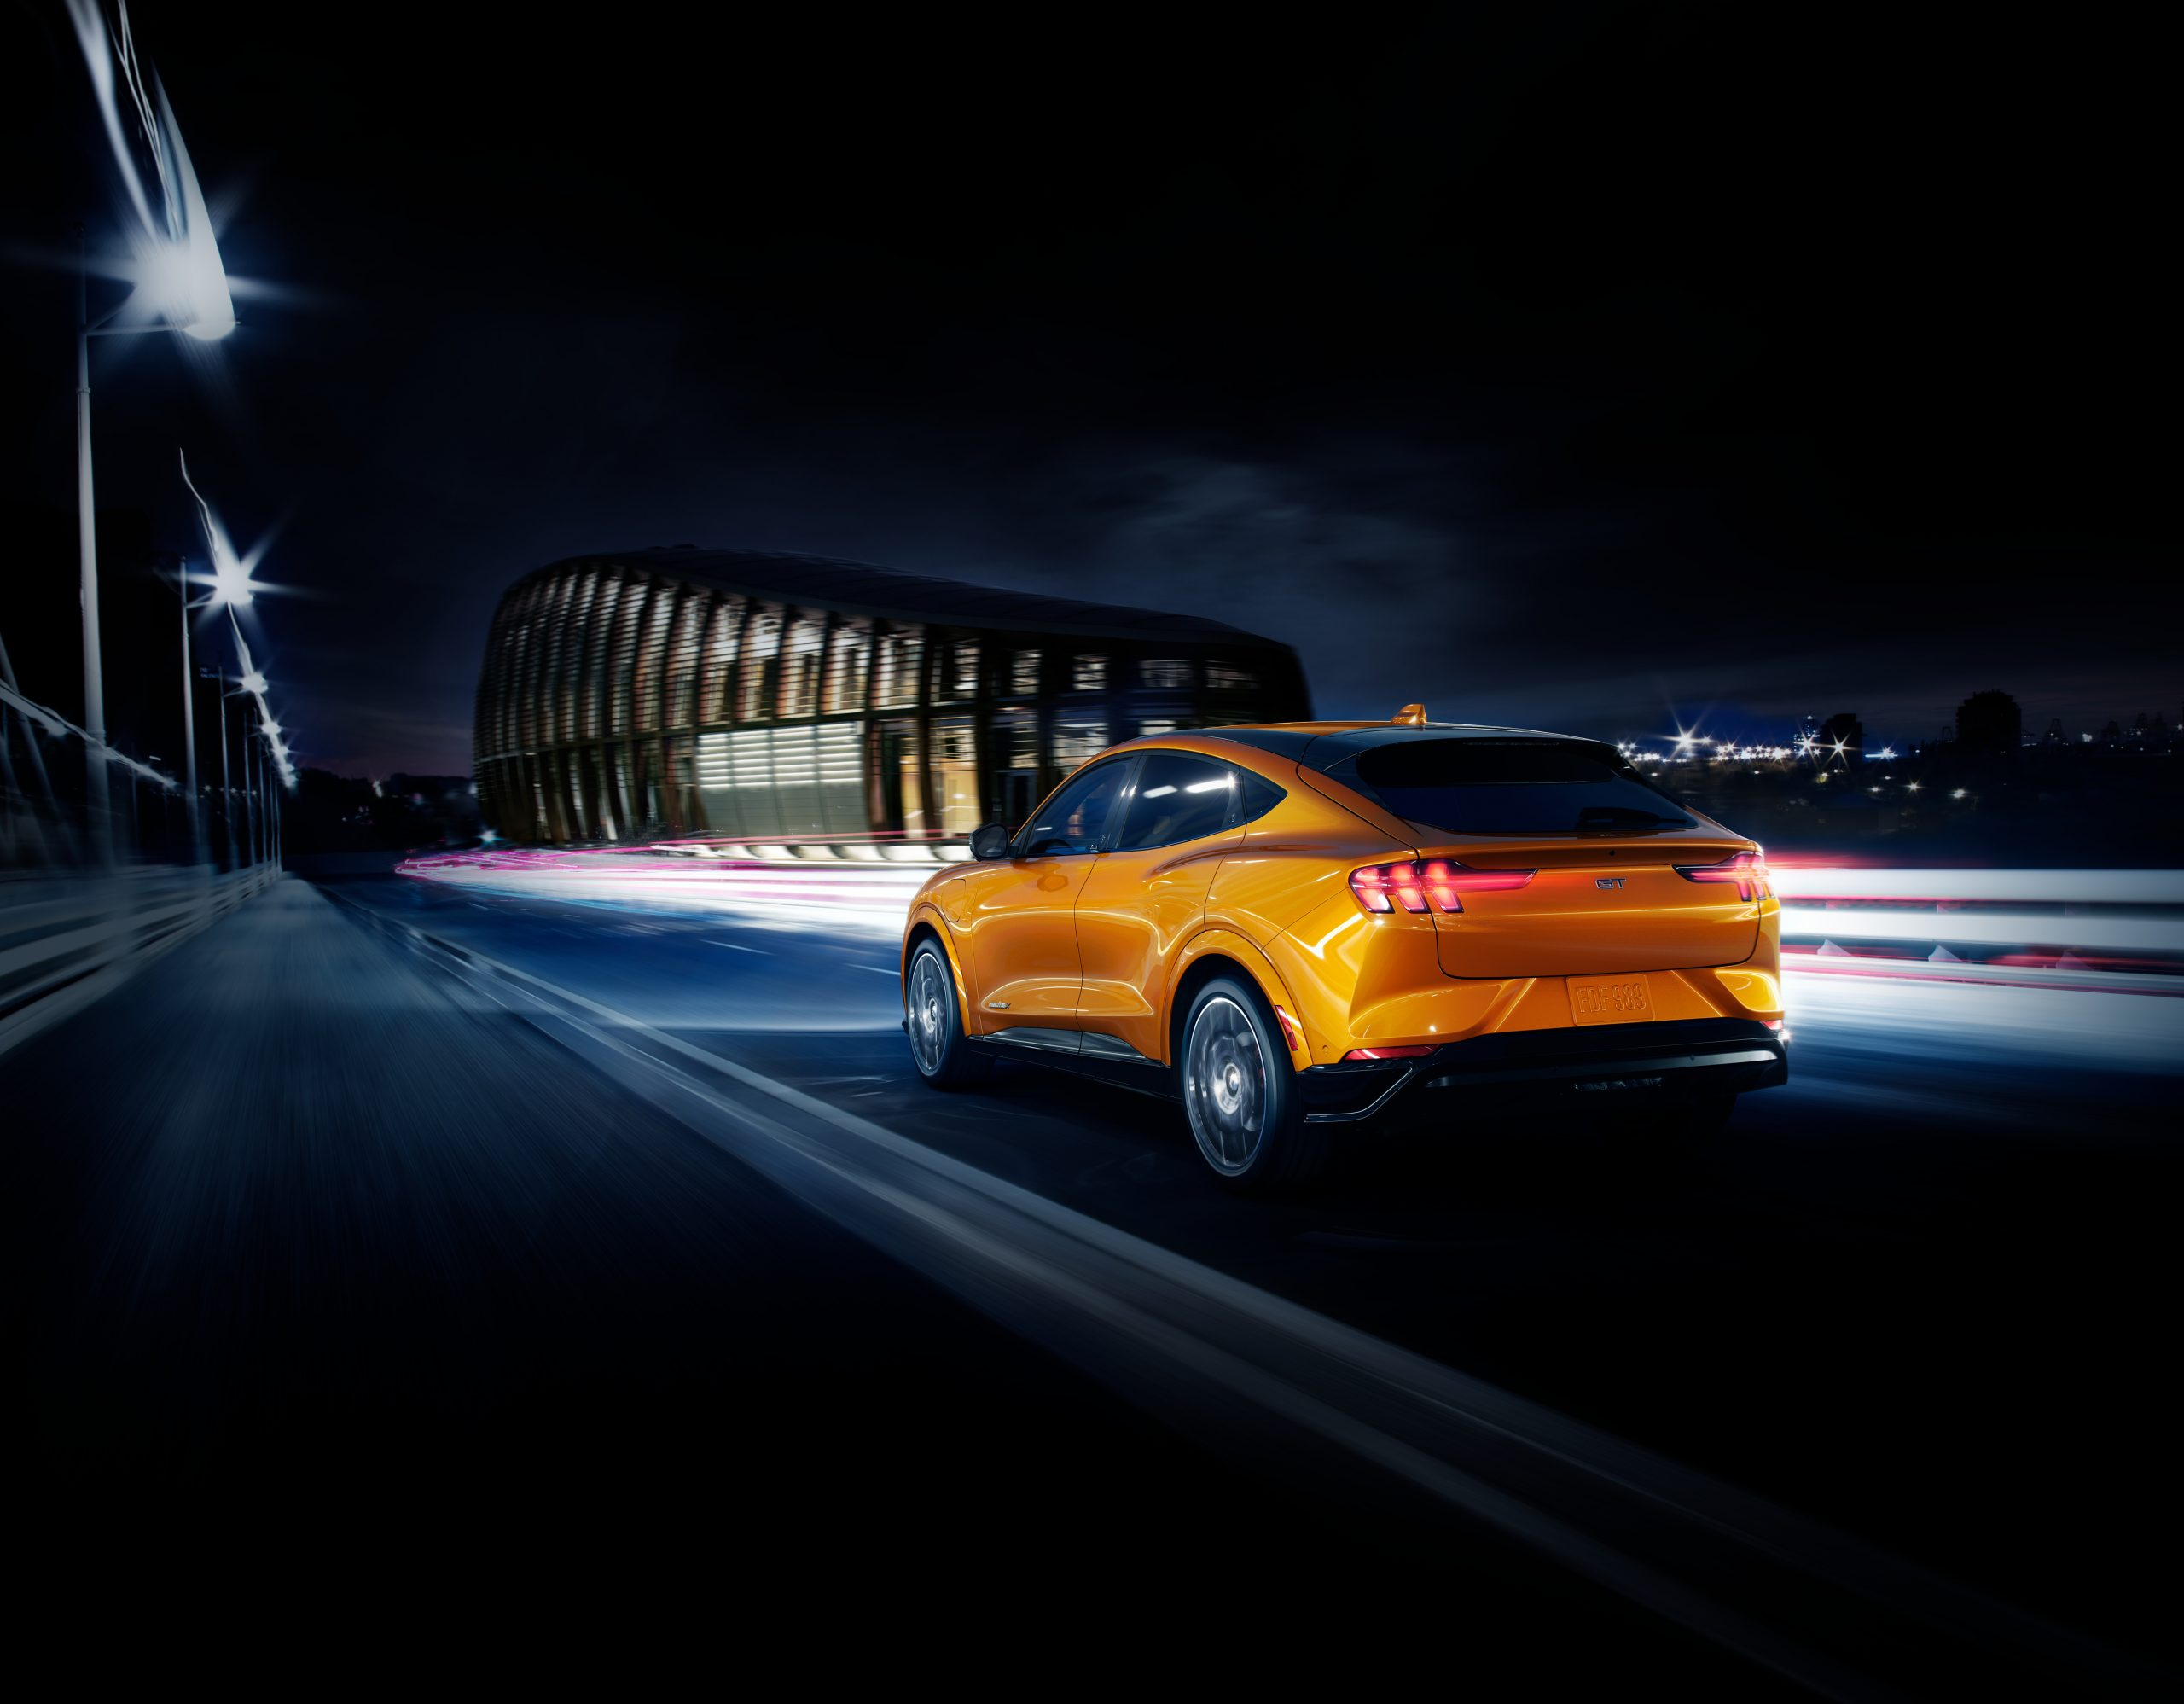 2020 FORD MACH E GT CYBER ORANGE 02 scaled Από 51.587 ευρώ η τιμή της Ford Mustang Mach-E στην Ελλάδα Electric cars, electric vehicles, EV, Ford, Ford Mustang, Ford Mustang Mach-E, zblog, ειδήσεις, ηλεκτρικά, ηλεκτροκινηση, κινουμαι ηλεκτρικα, Νέα